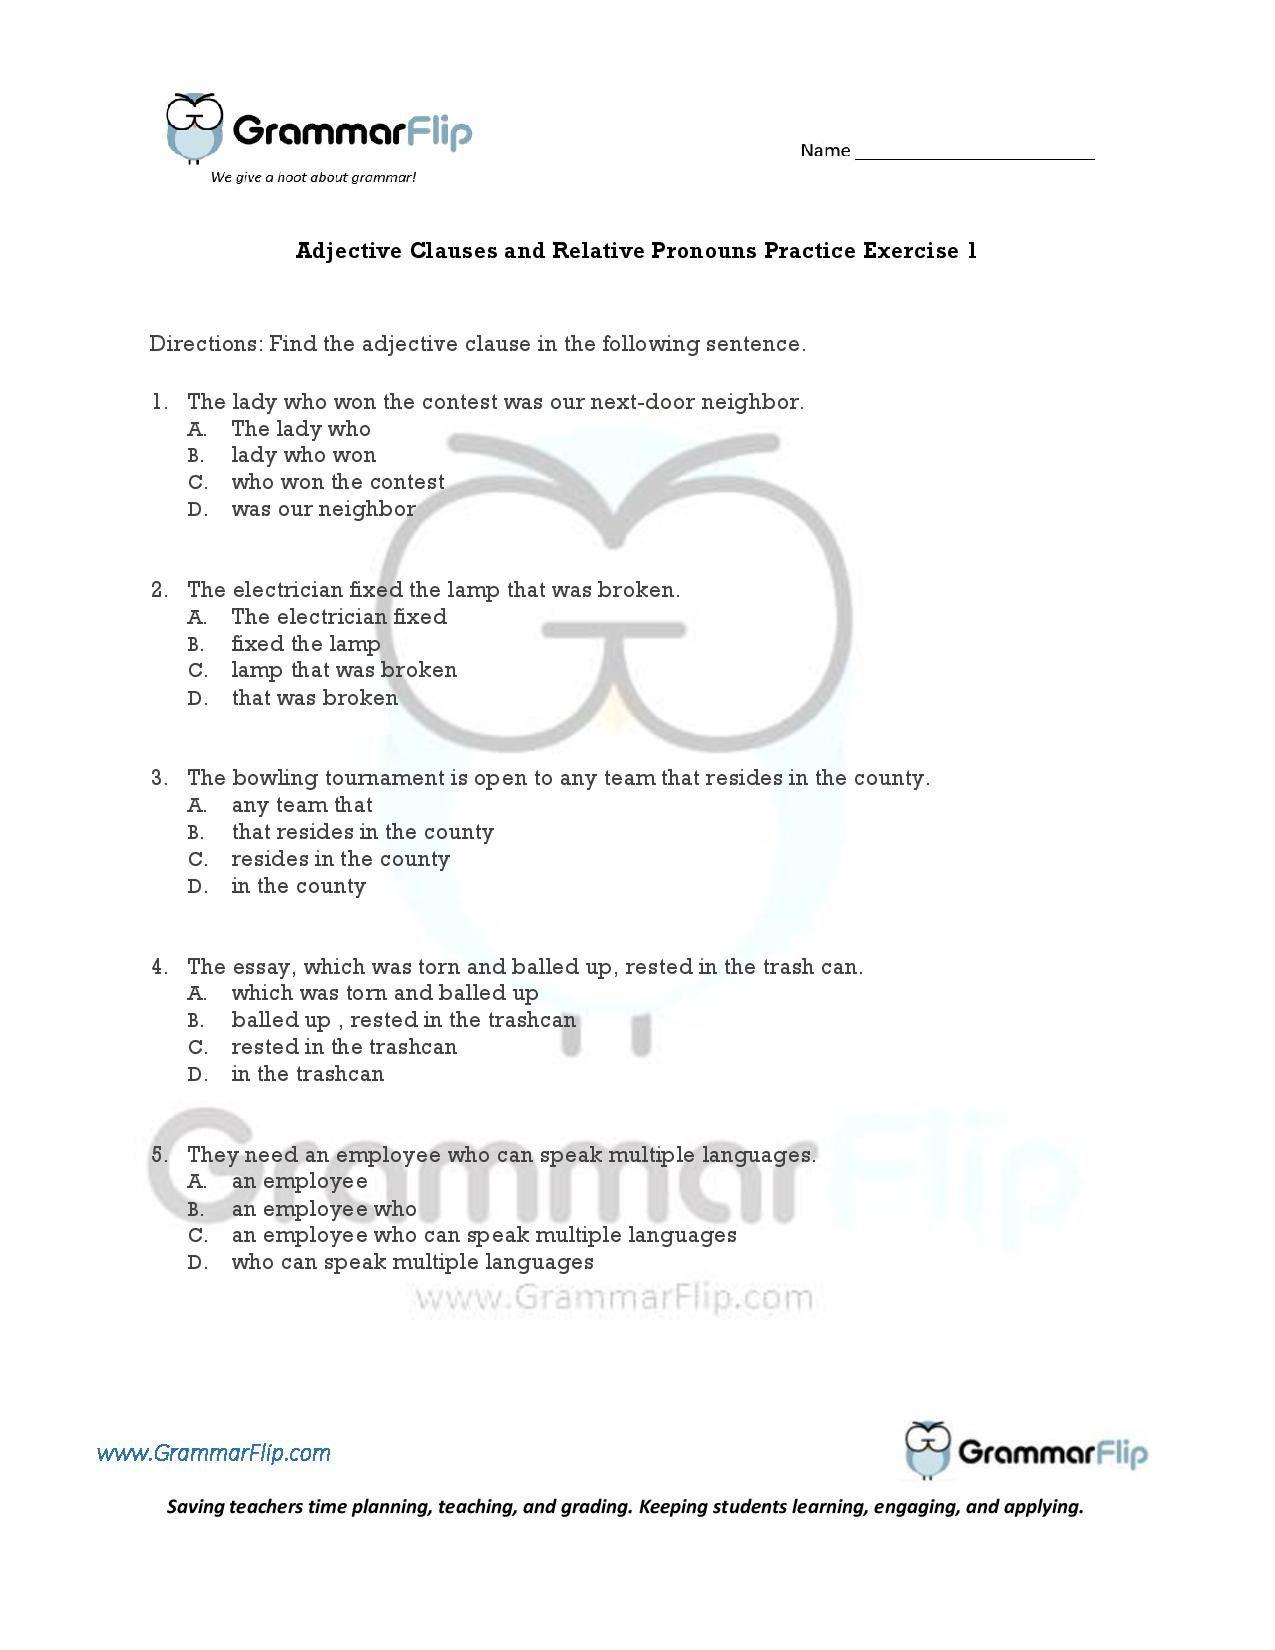 Relative Pronouns Worksheet Grade 4 In 2020 Relative Pronouns Pronoun Worksheets Phonics Worksheets Grade 1